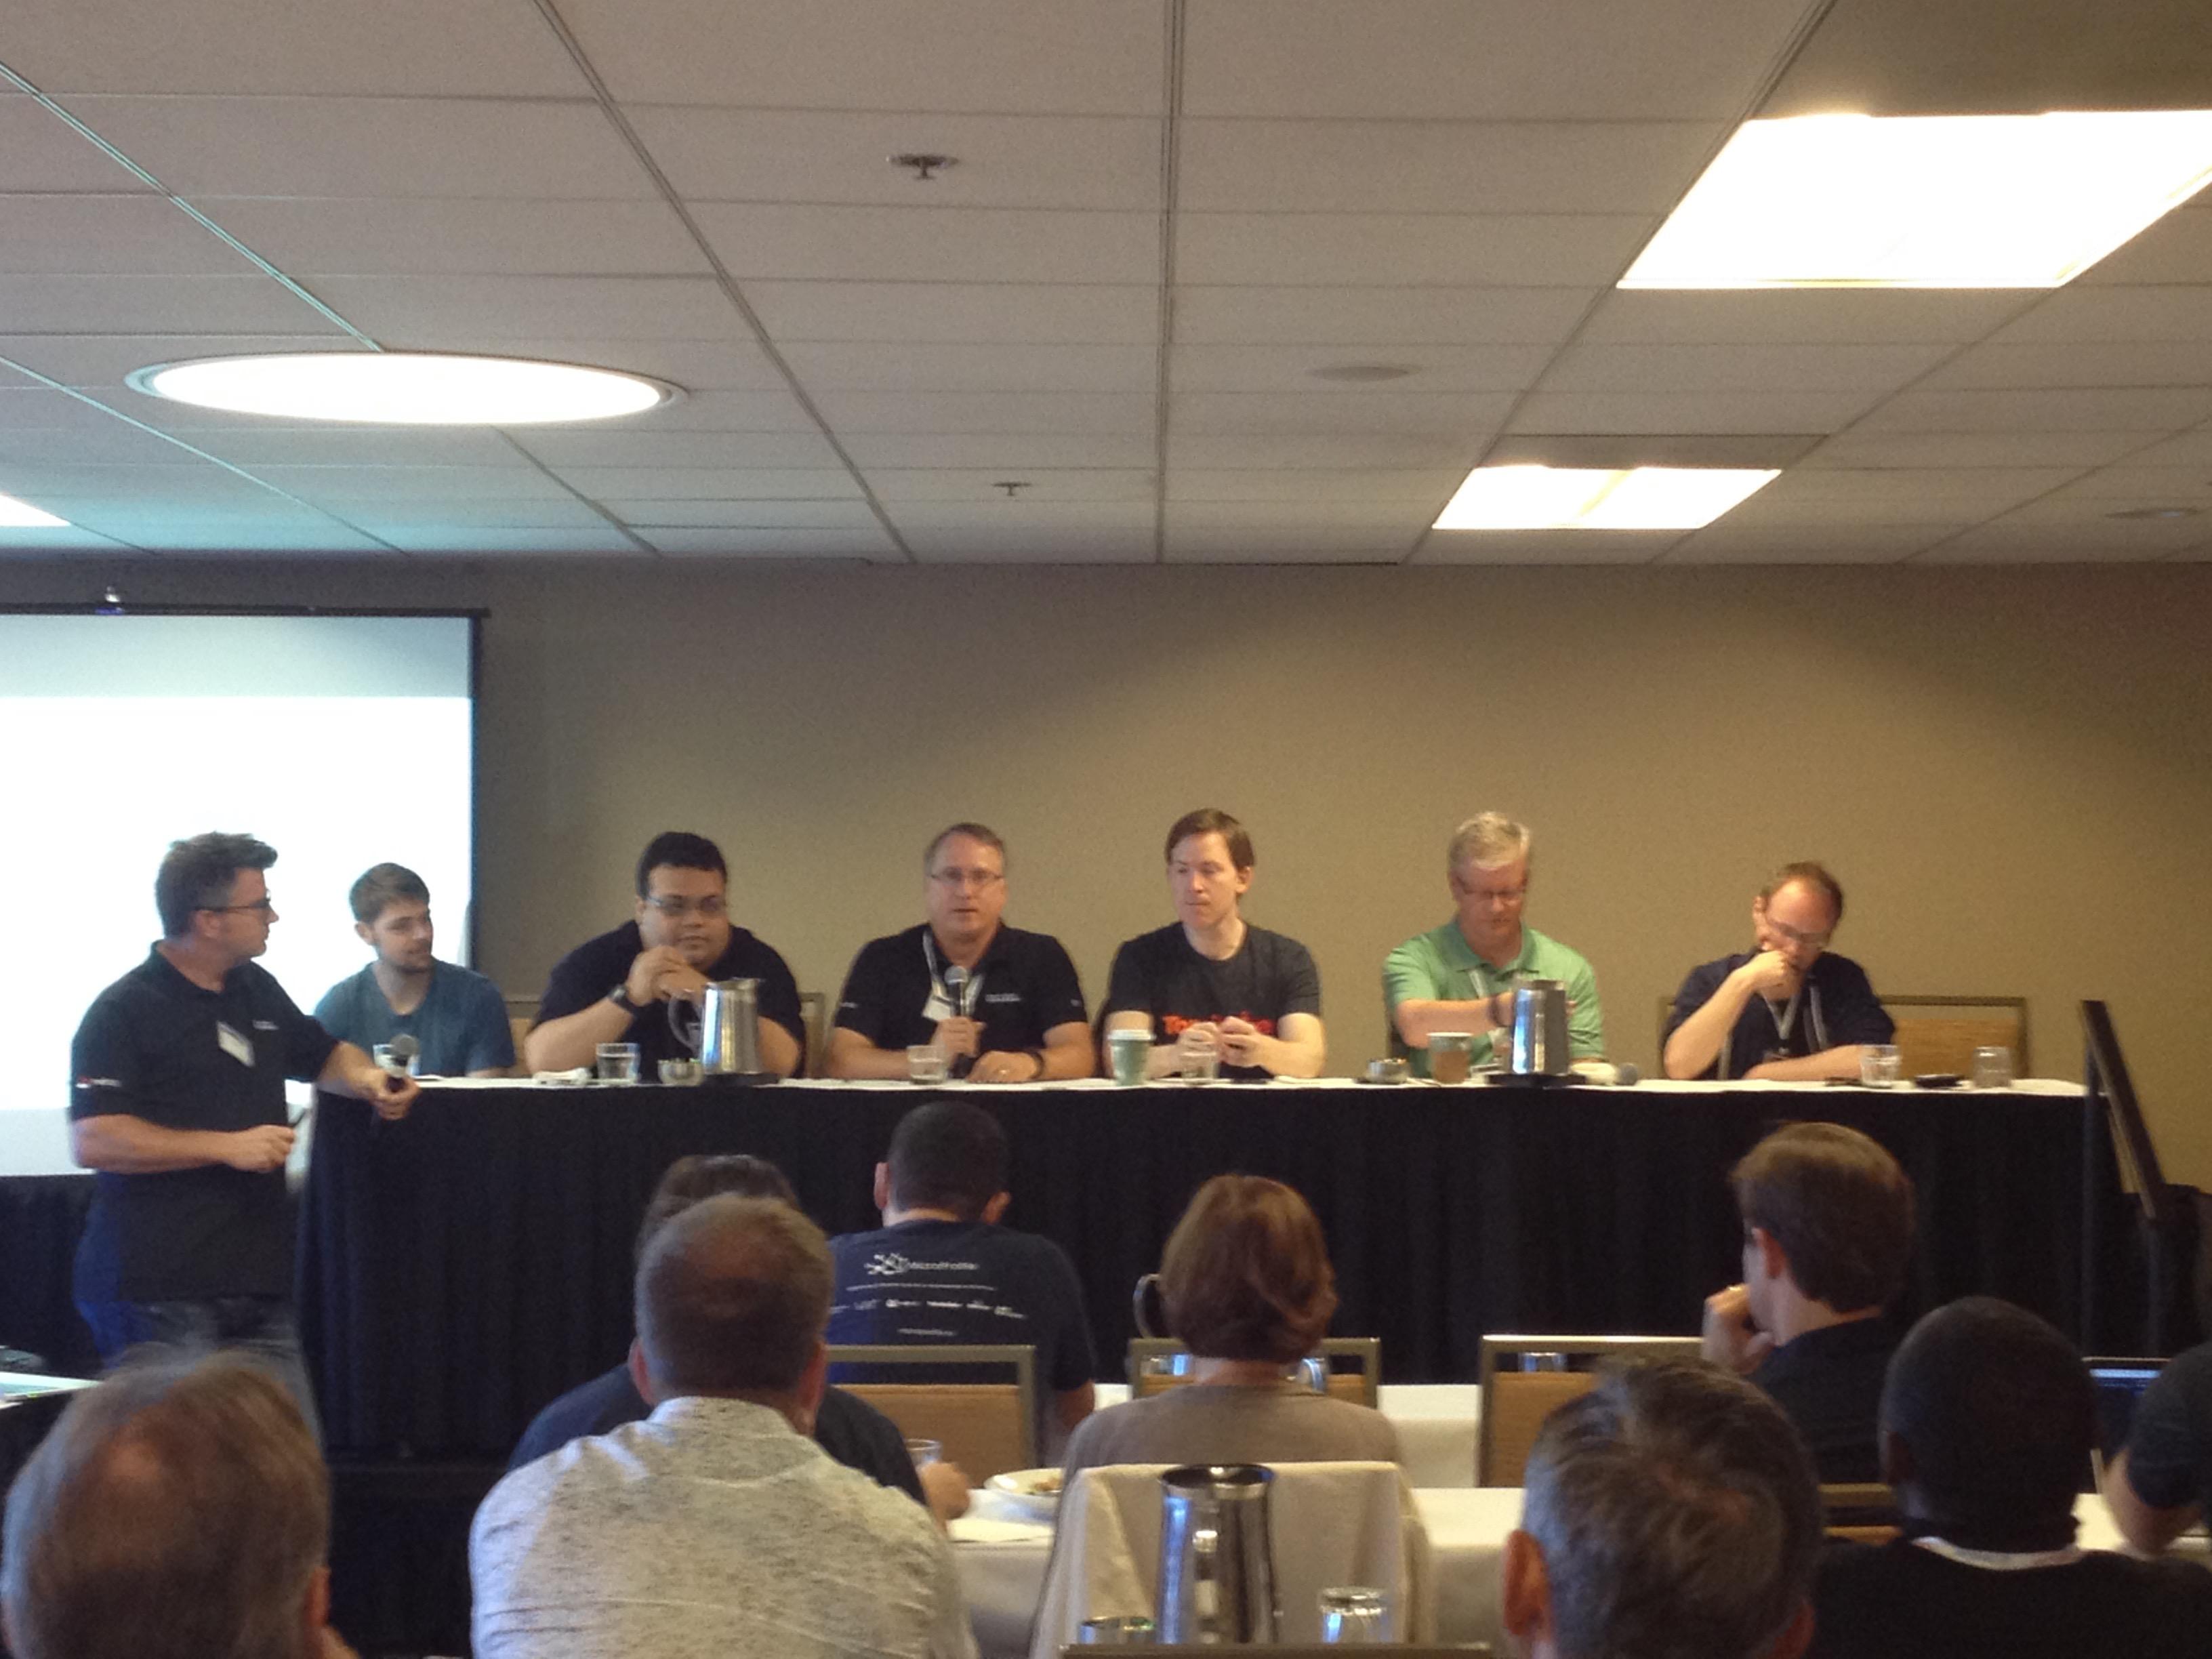 Members of the Microprofile panel held during JavaOne